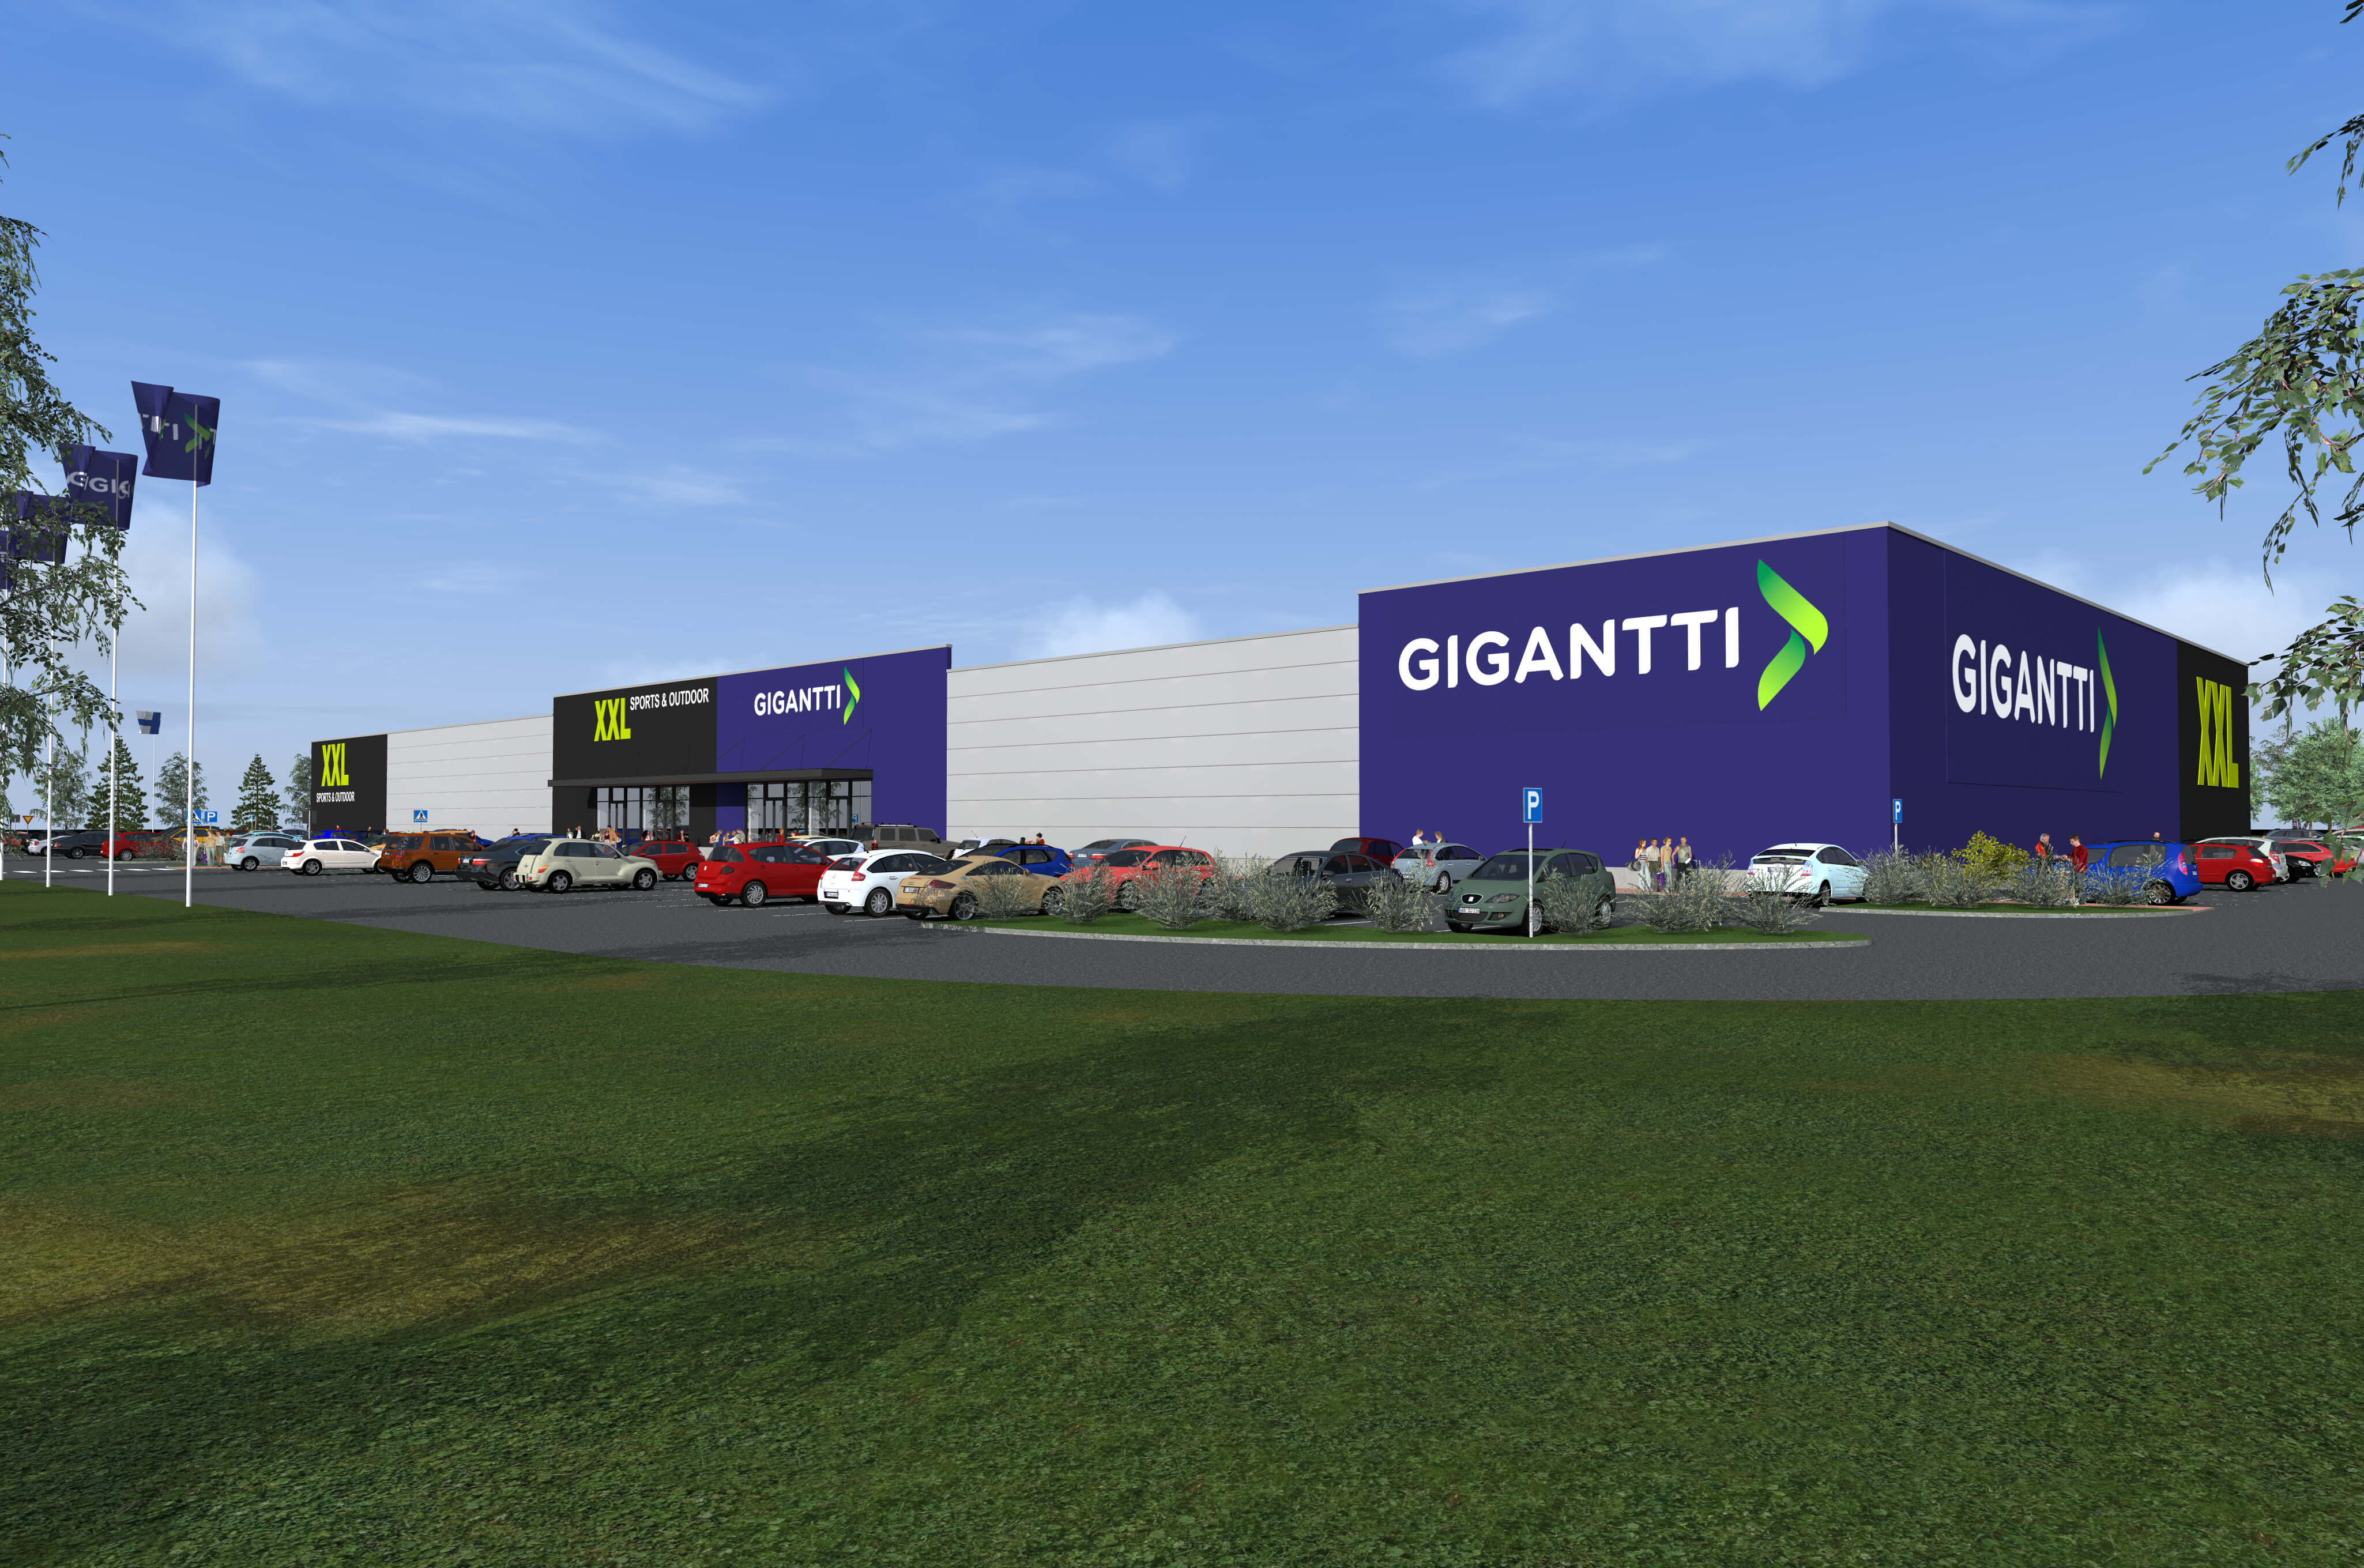 Gigantit